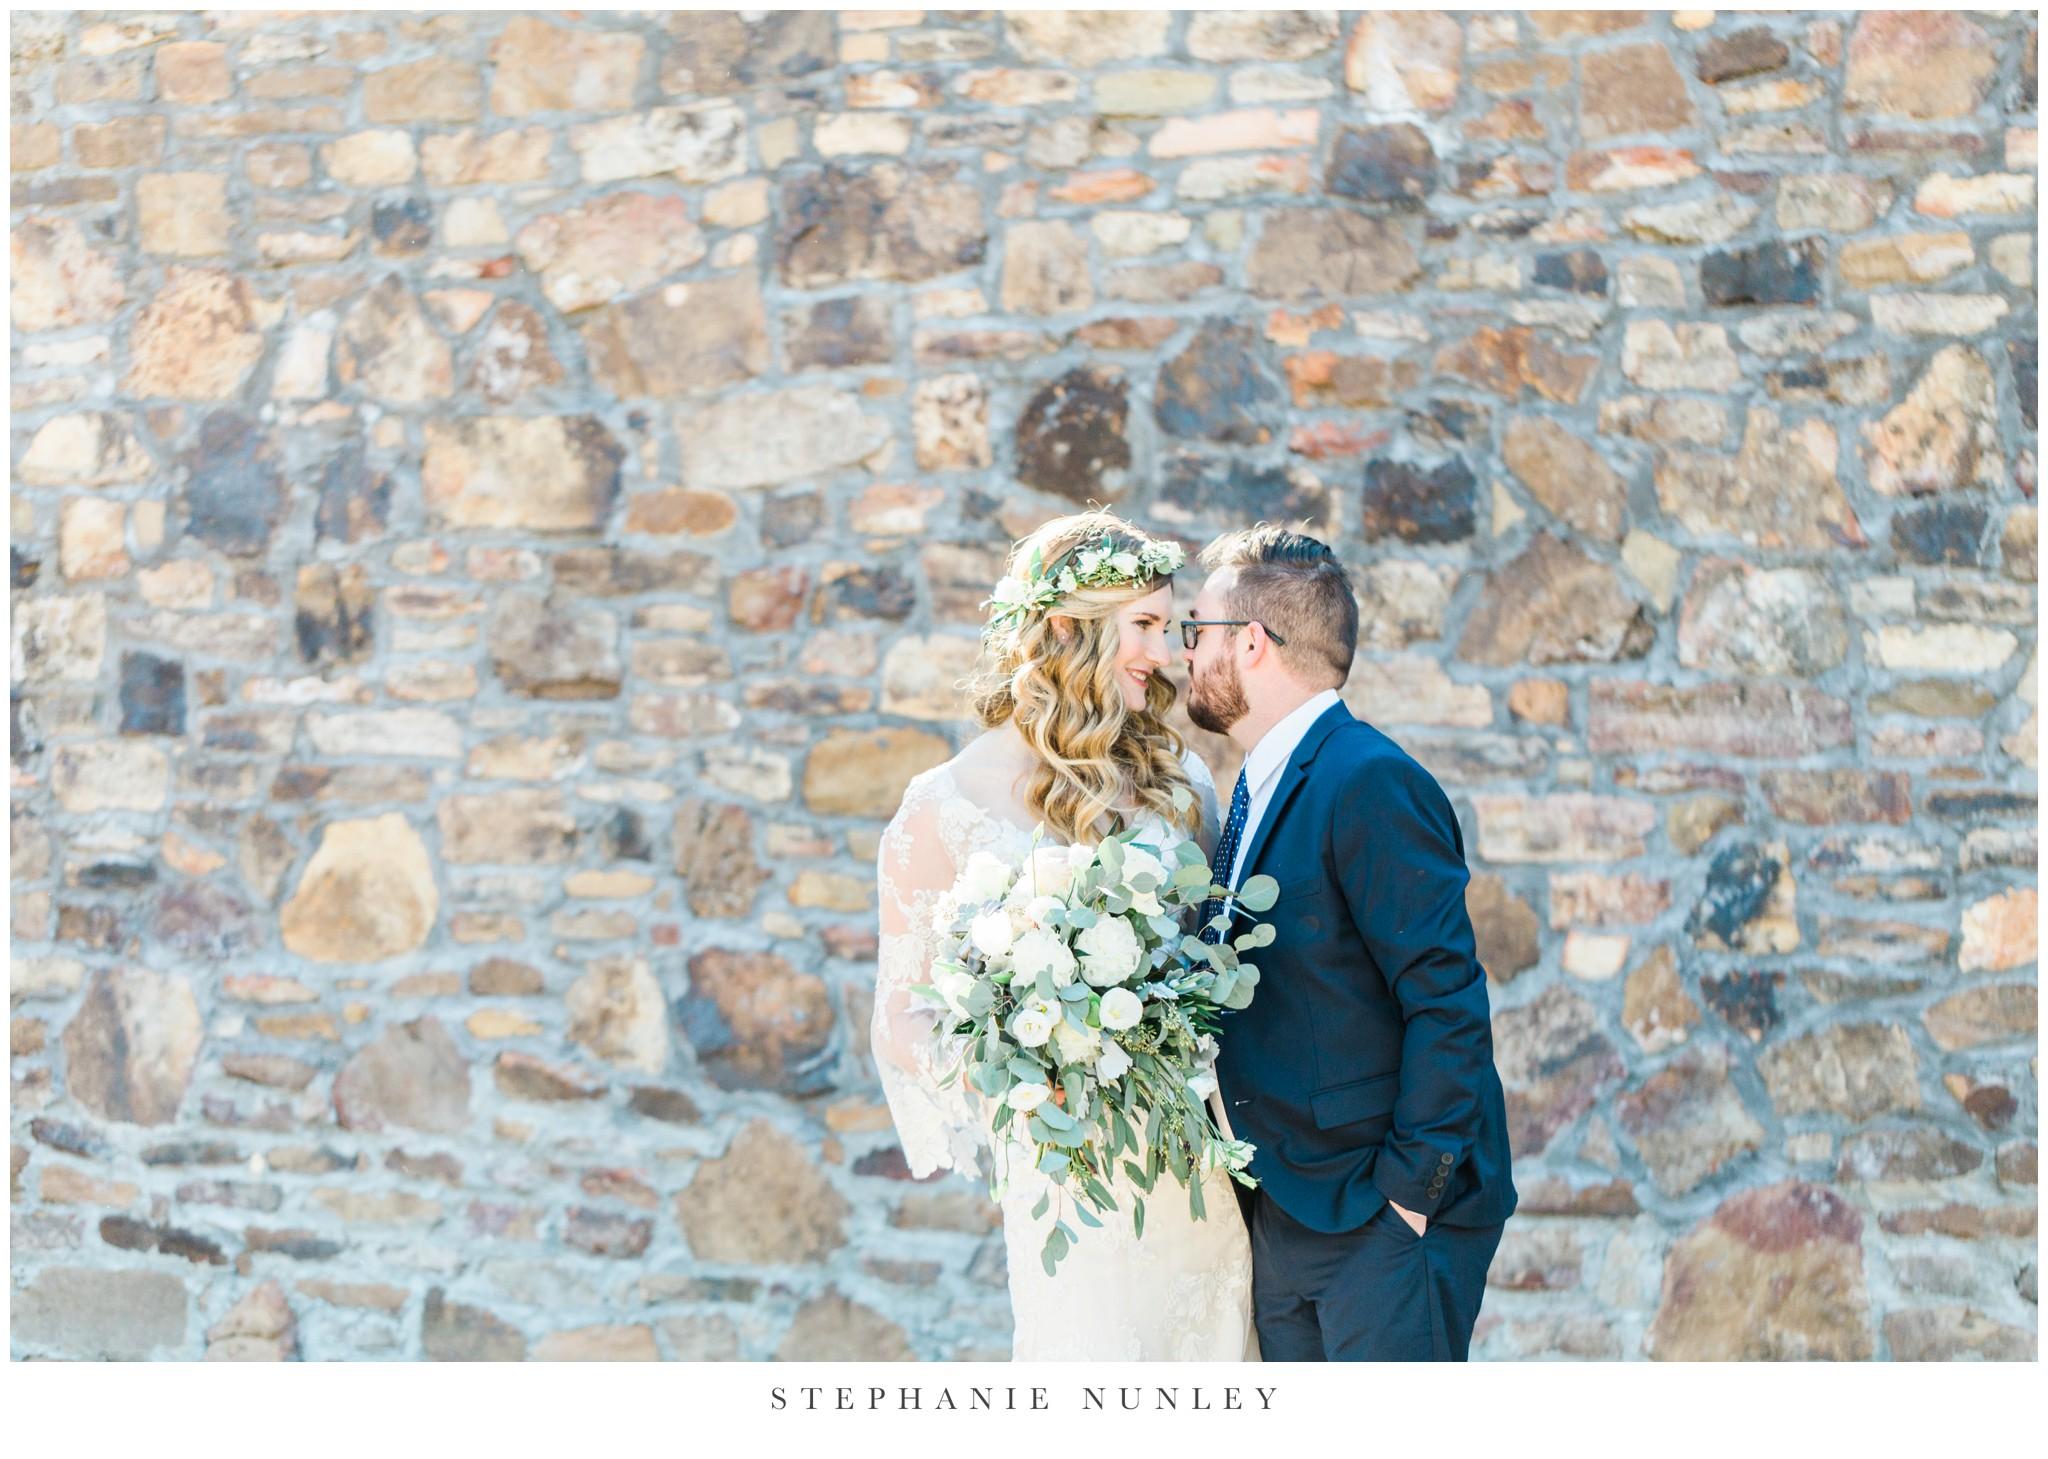 sassafrass-springs-vineyard-film-wedding-photos-37.jpg